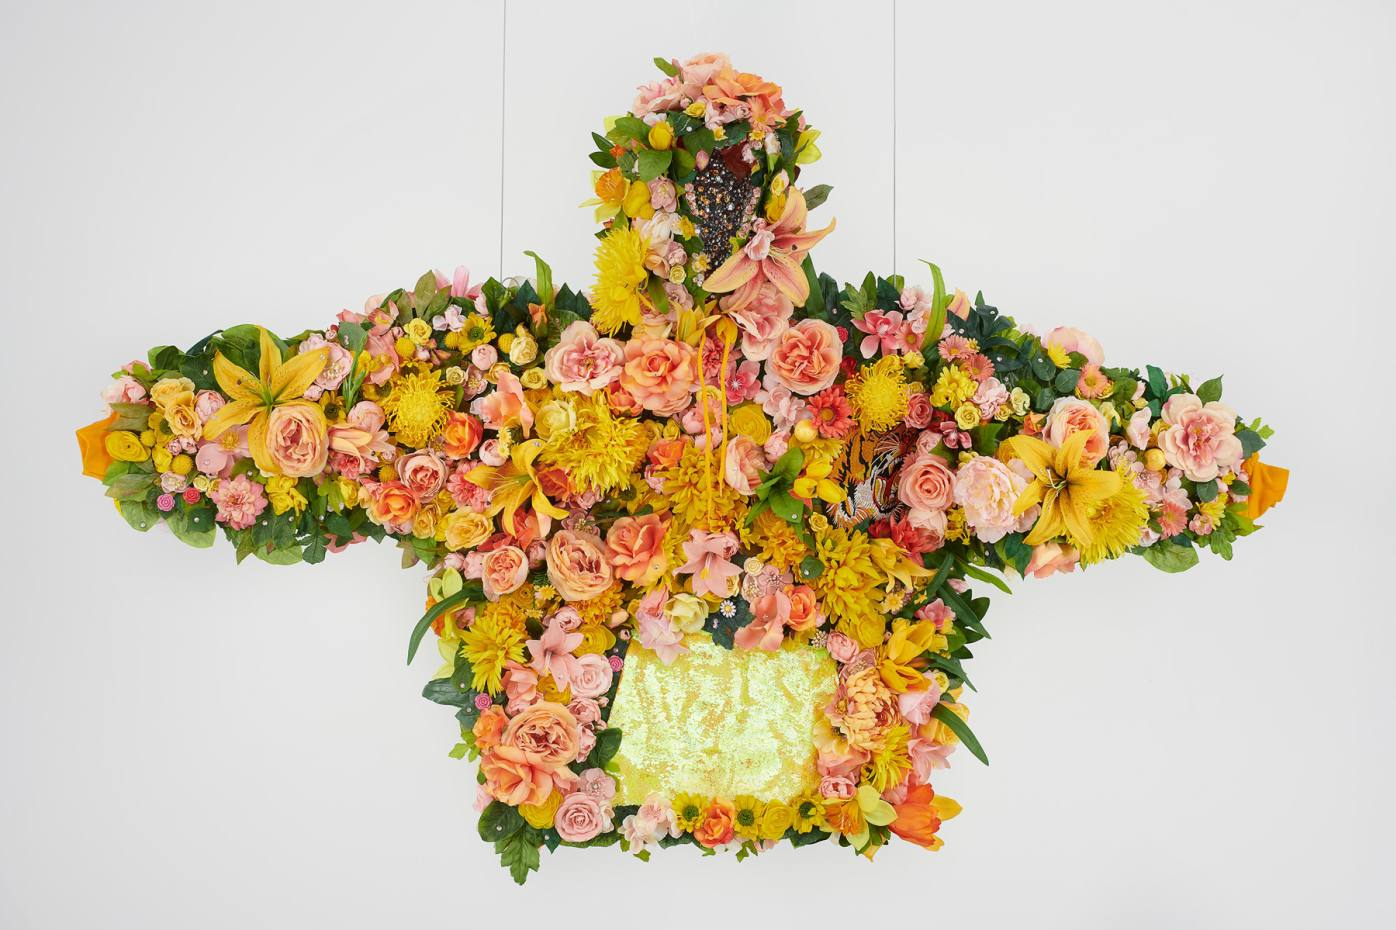 Devan Shimoyama's February II, 2019 features in The Hoodie at the Het Nieuwe Instituut, Rotterdam